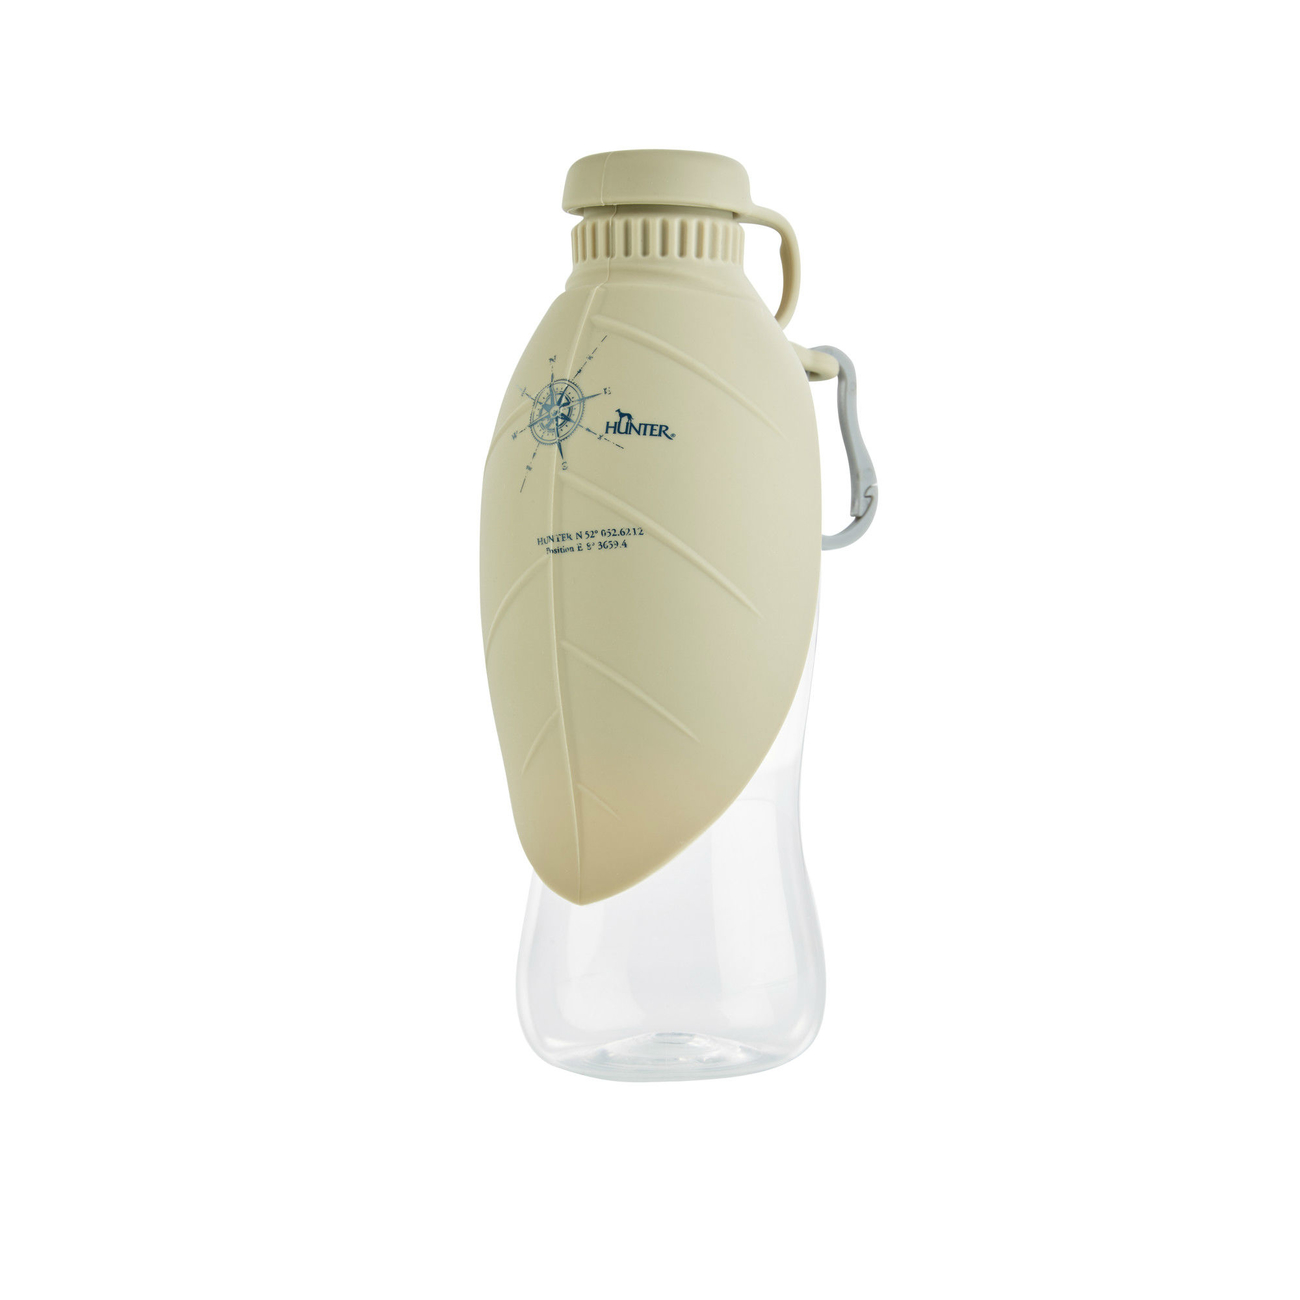 Hunter Outdoor Hunde Trinkflasche mit Silikonnapf List 65129, Bild 2